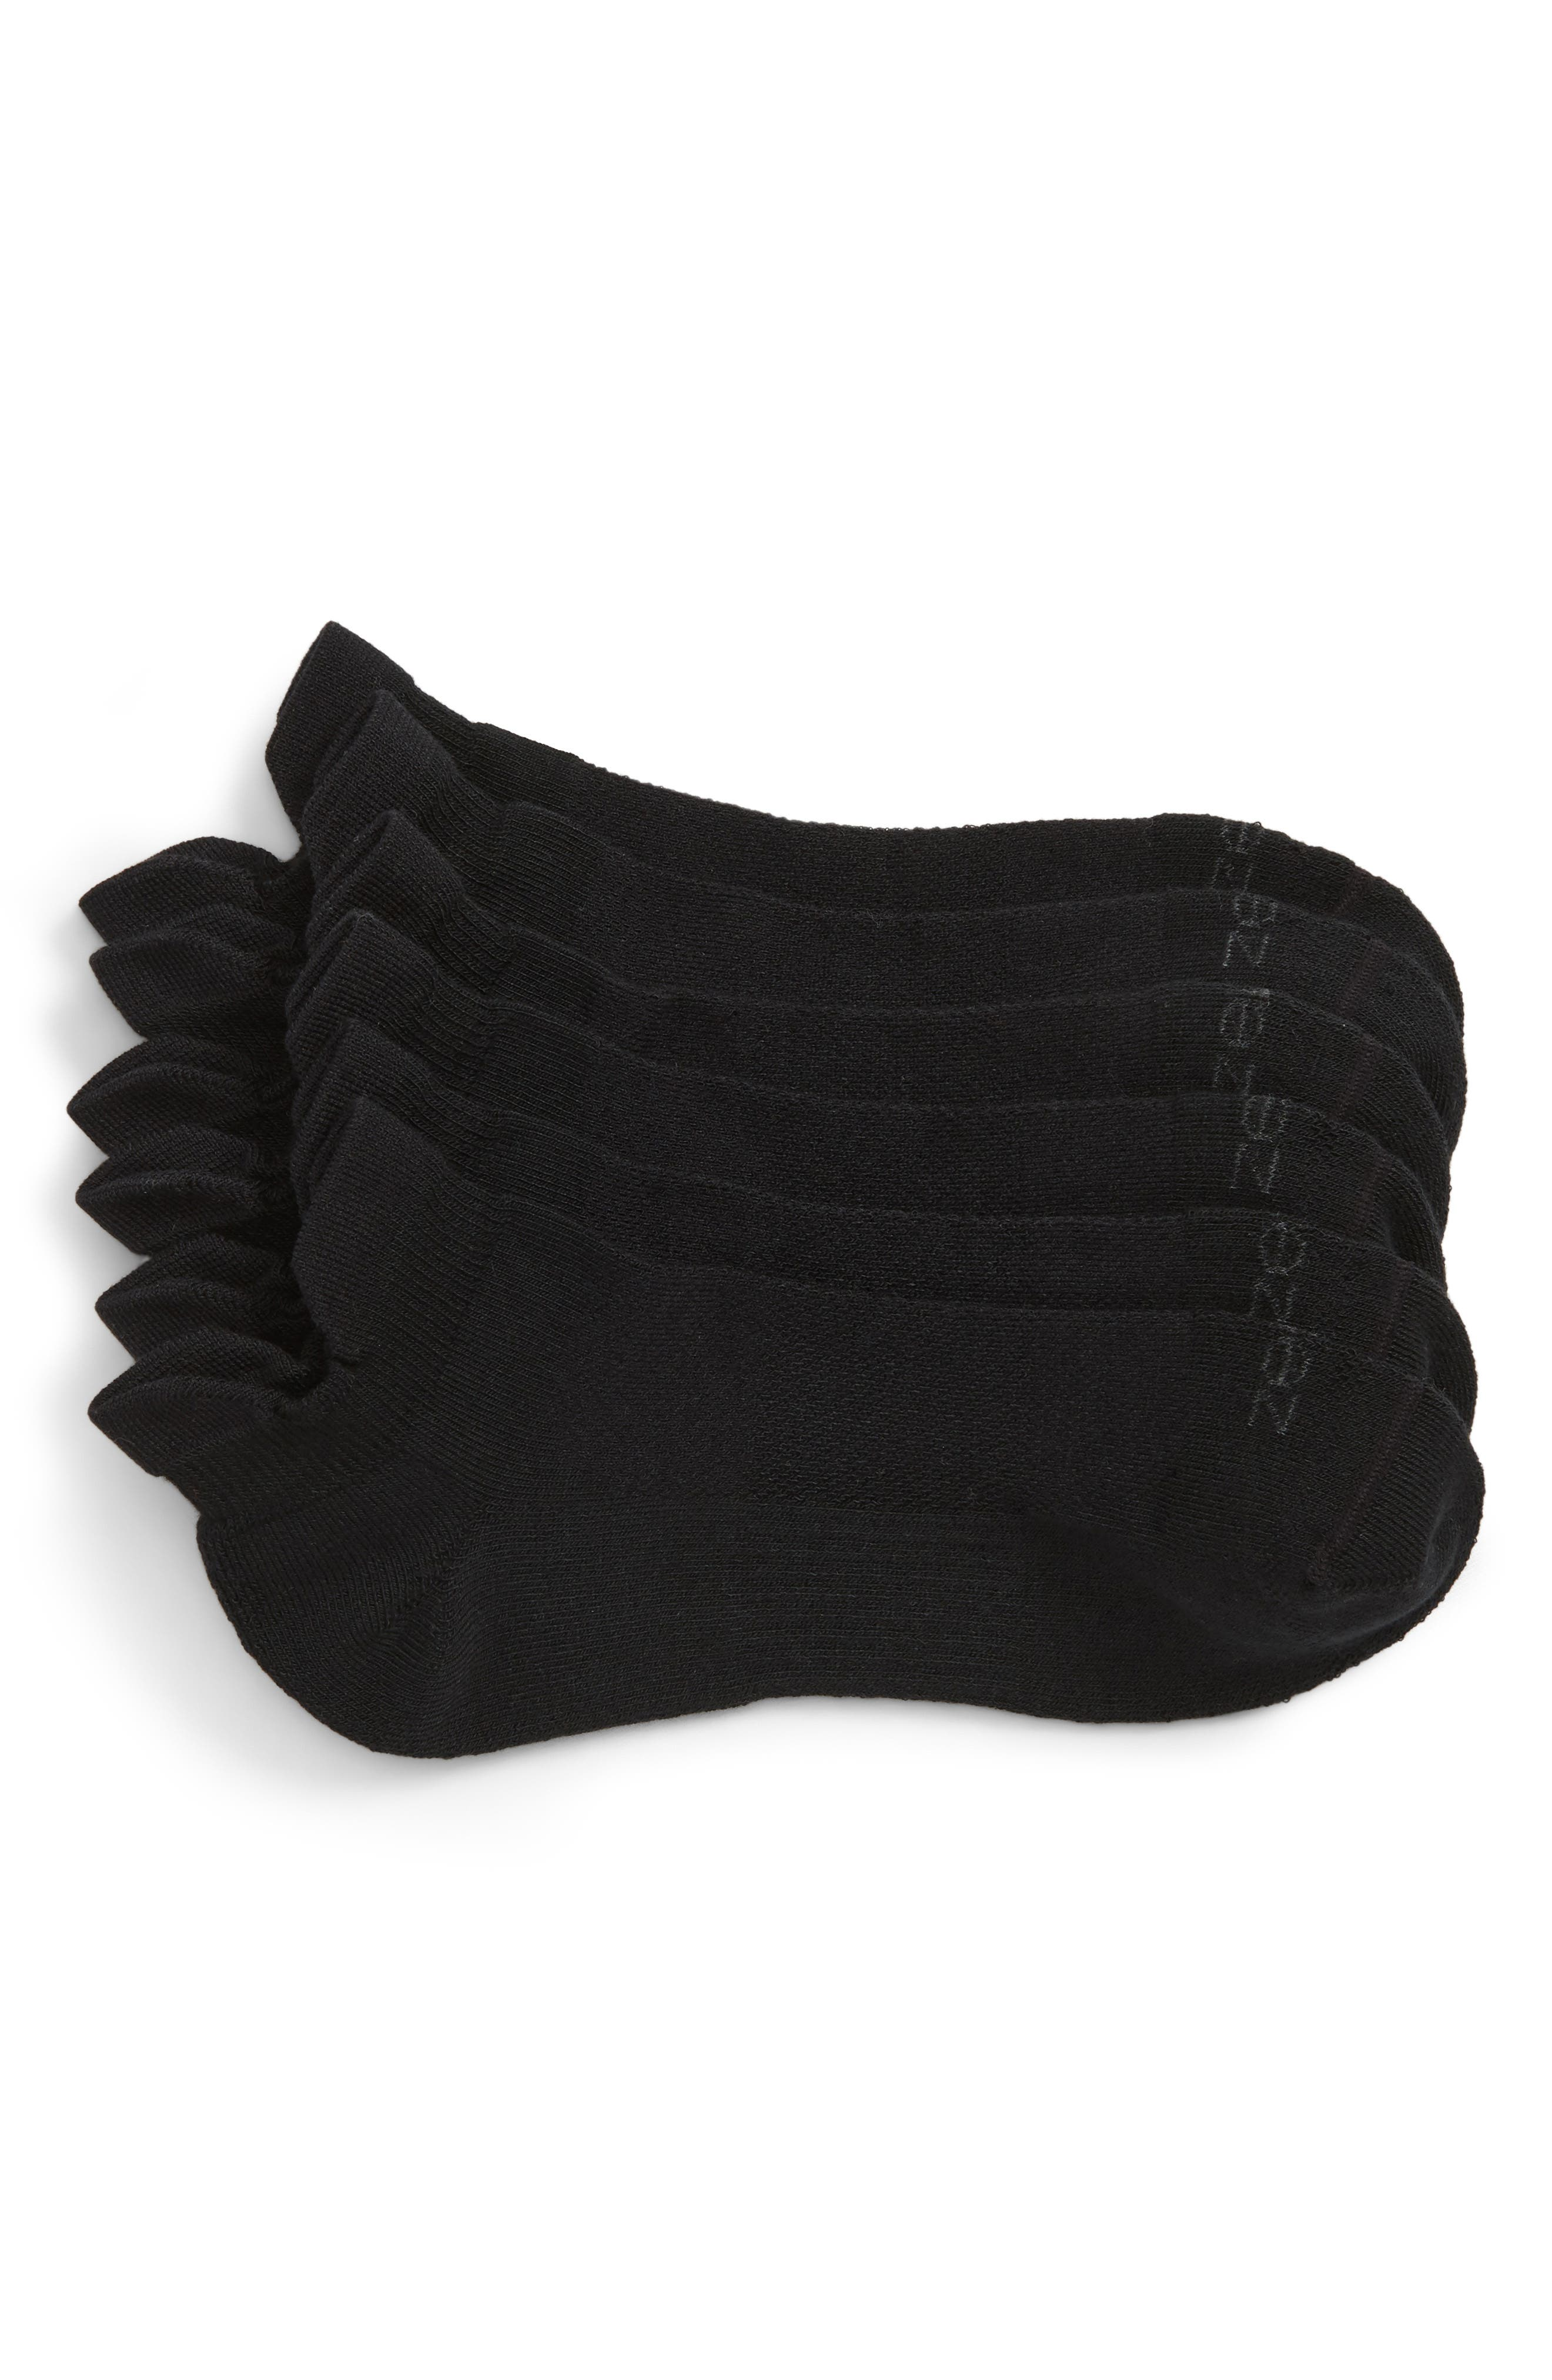 ZELLA 3-Pack Double Tab Running Socks, Main, color, BLACK